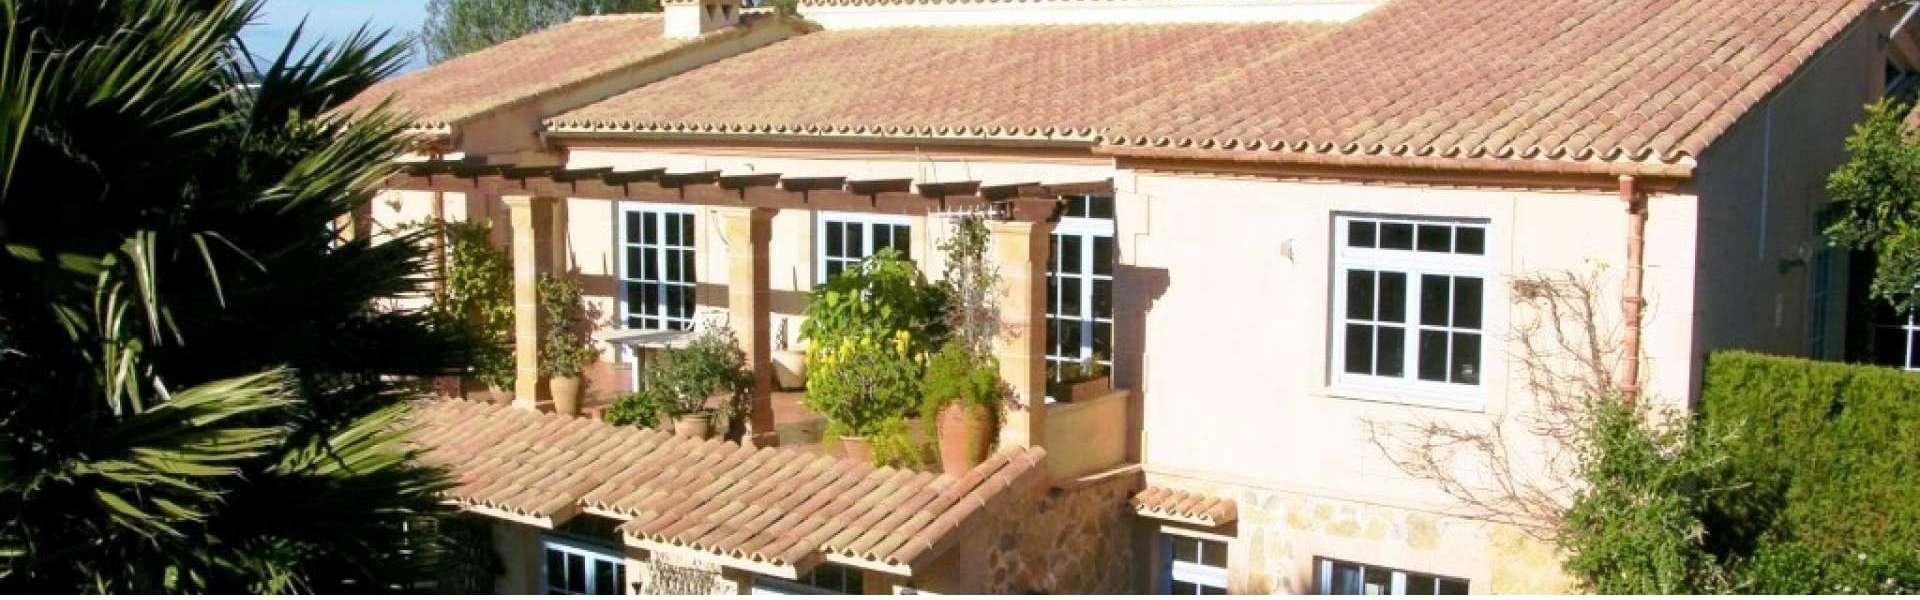 Ruhig gelegenes Finca-Anwesen nahe Porto Cristo